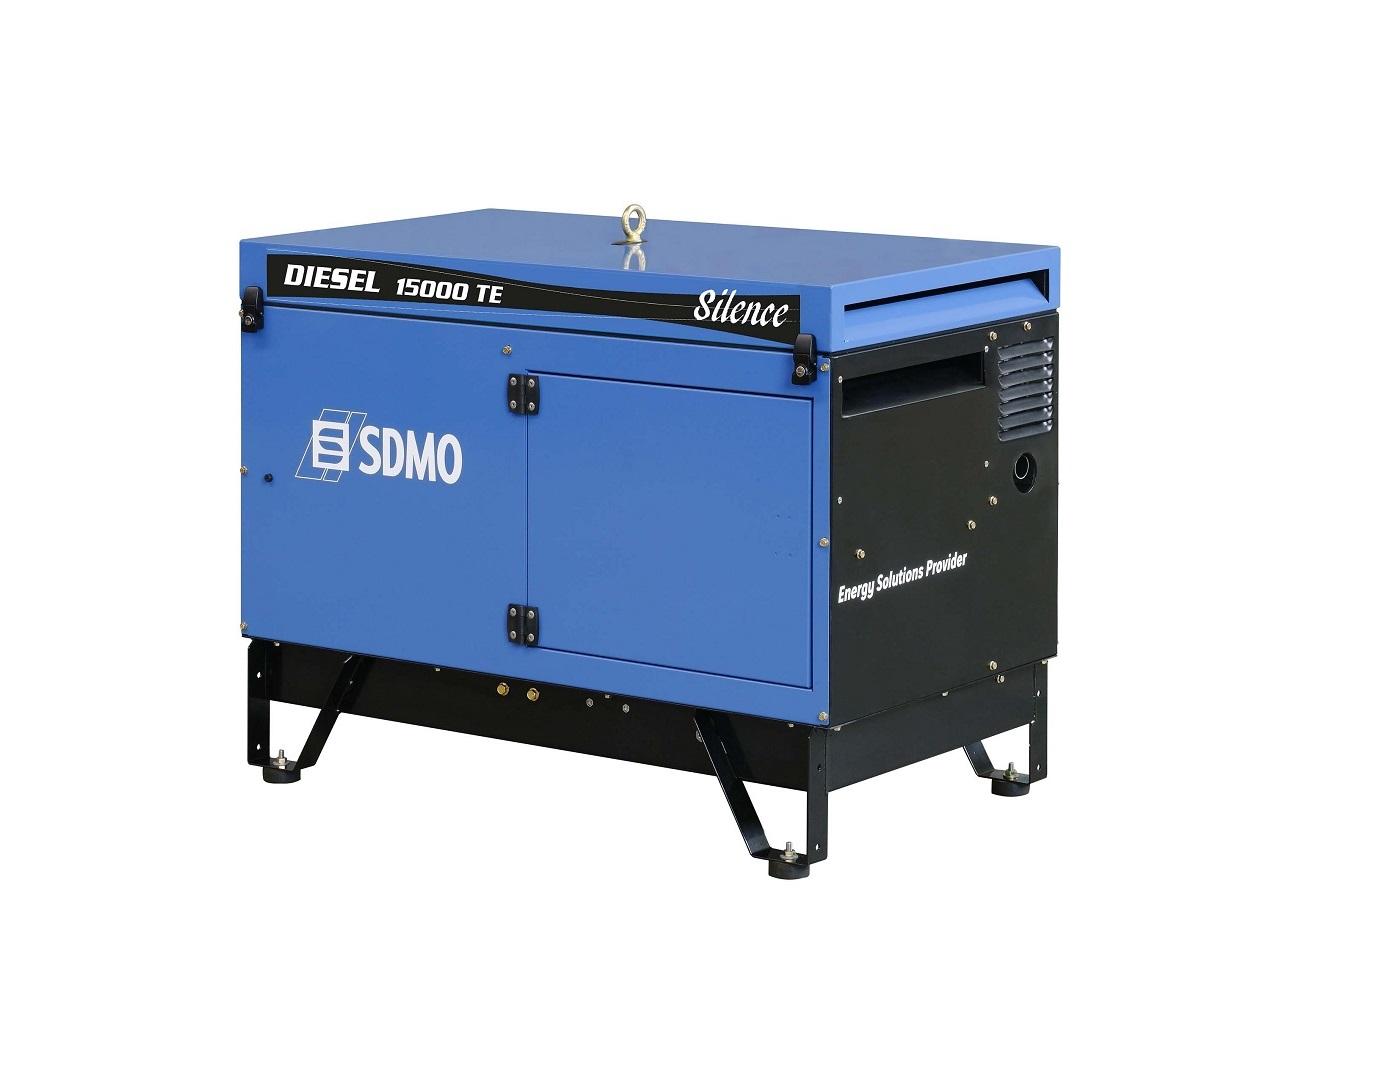 Дизельный генератор (электростанция) SDMO DIESEL 15000 TE AVR SILENCE